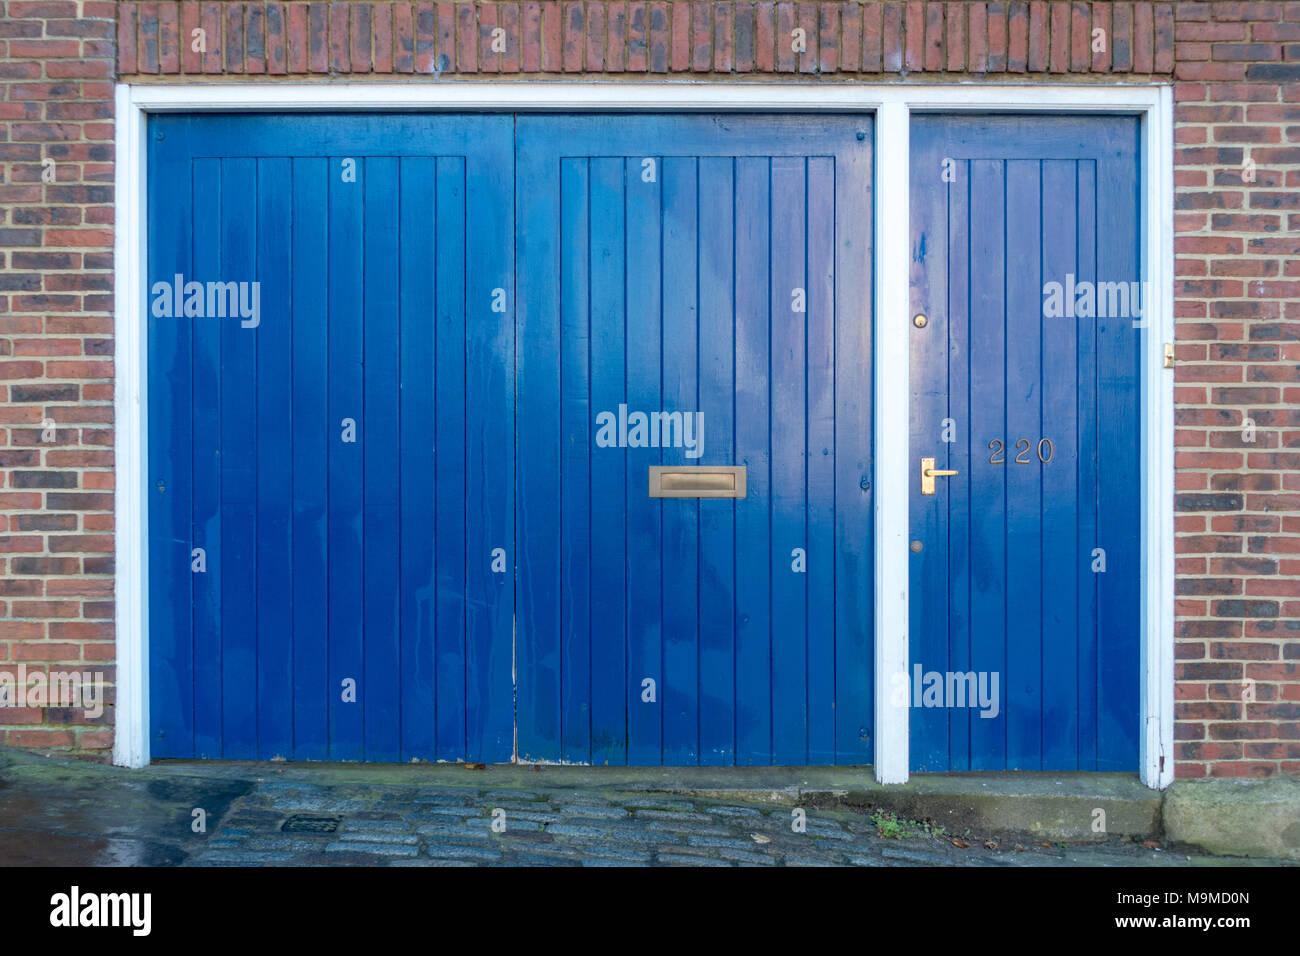 Blue Garage Doors In A Brick Building Stock Photo 178084837 Alamy